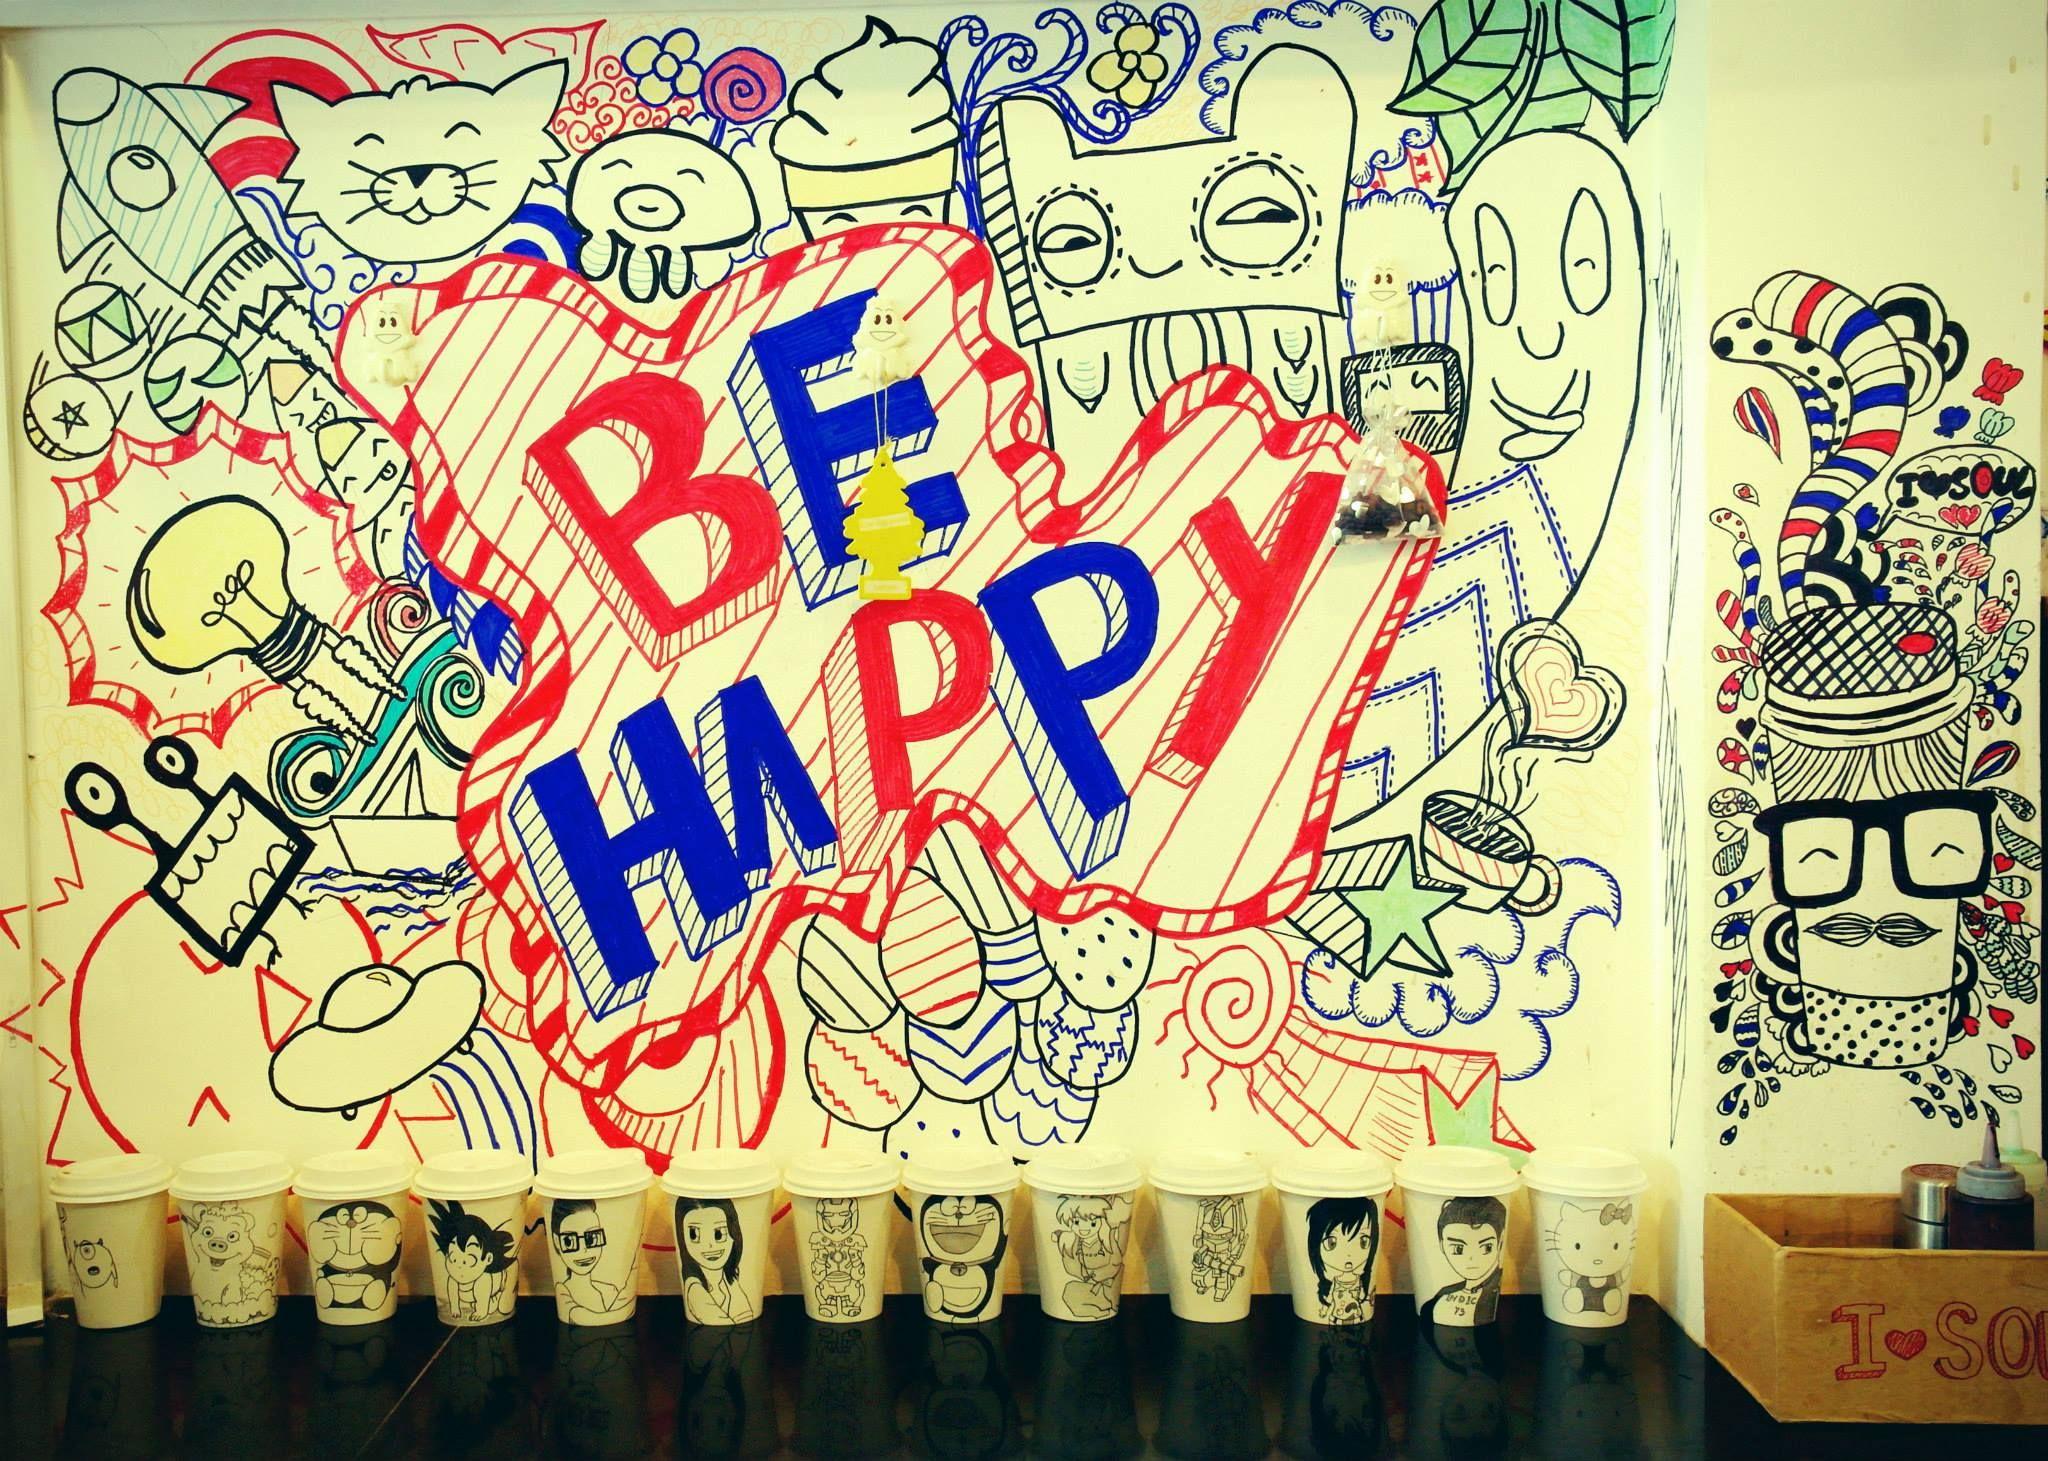 Exelent Wall Doodle Art Embellishment - Art & Wall Decor - hecatalog ...